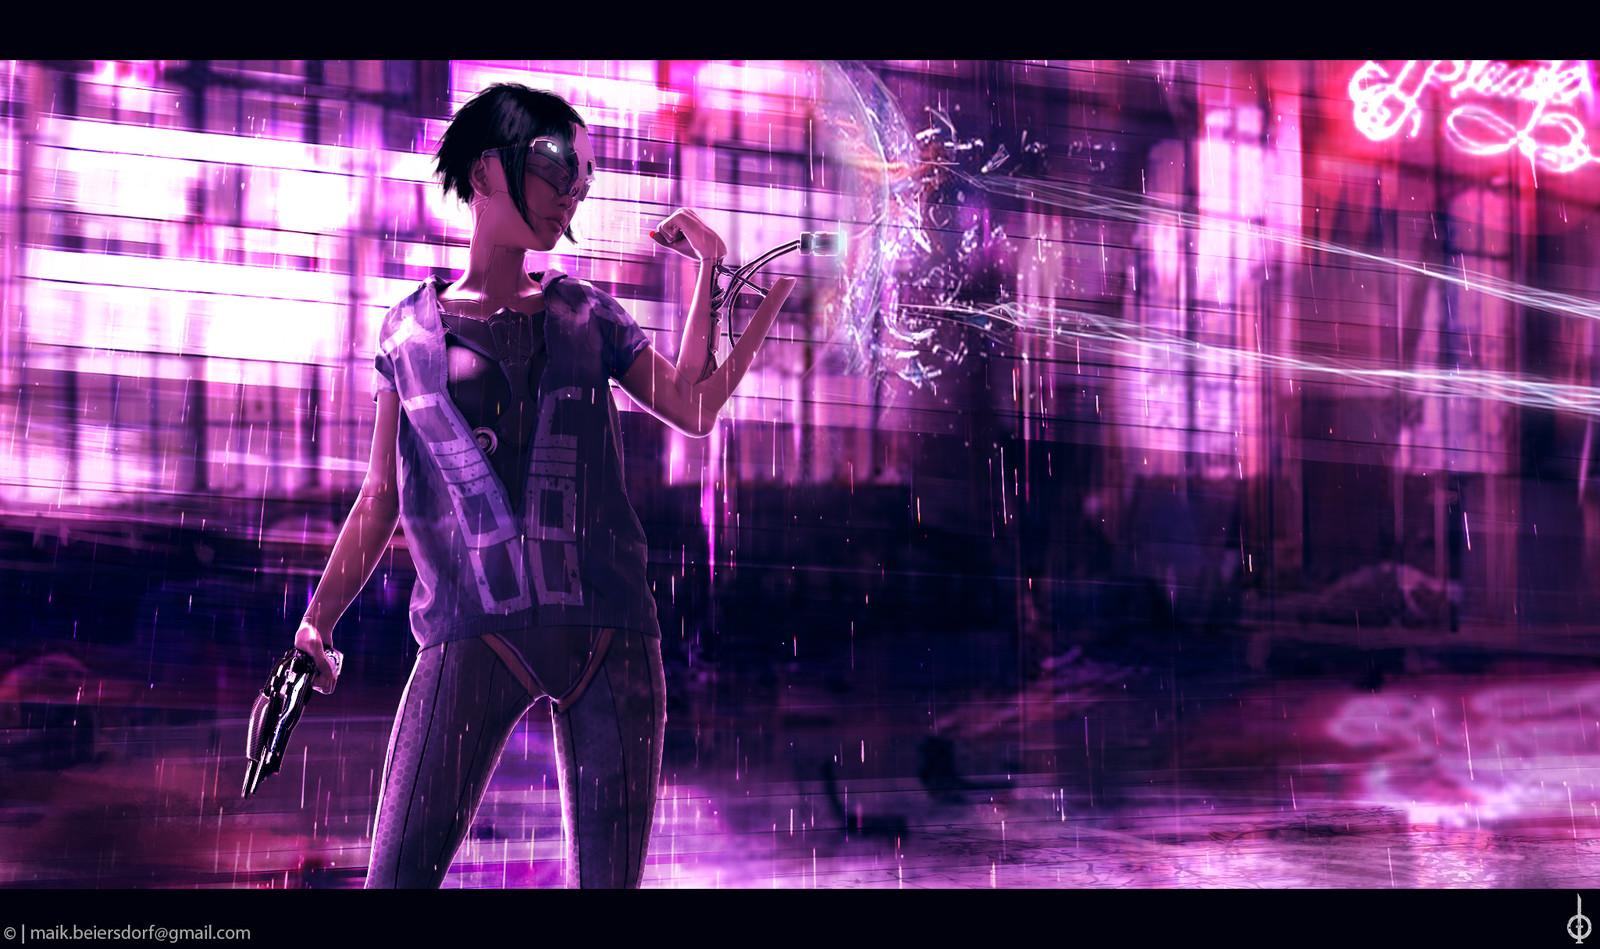 Cyborg Girl 02